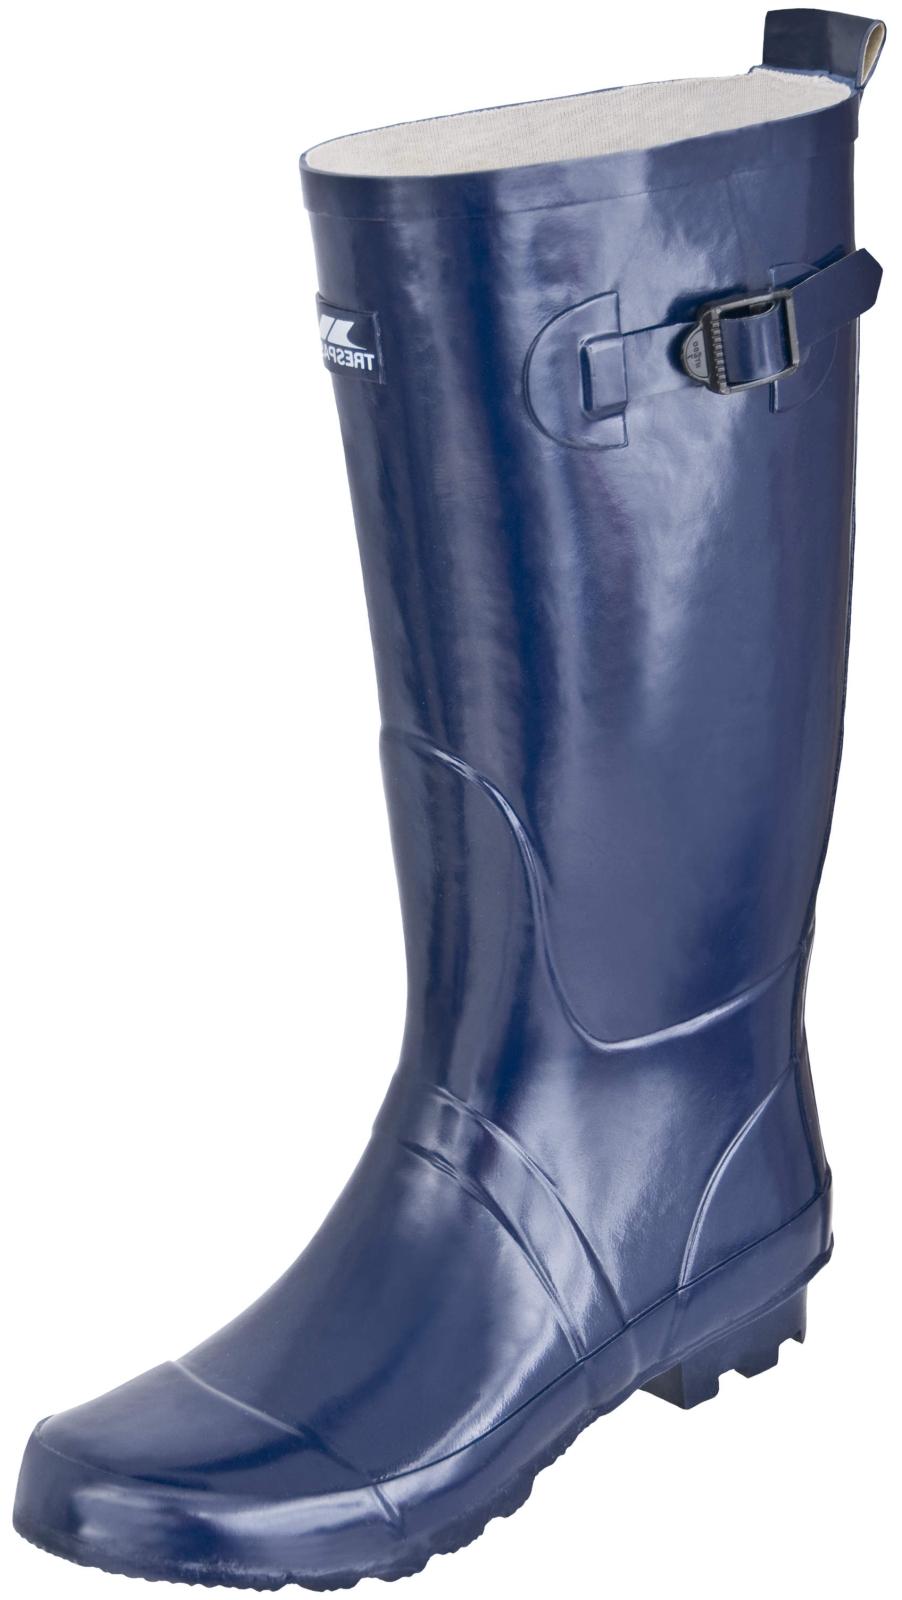 Mens TRESPASS RAFT Navy Blue Wellies Wellington Boots Size 7 8 9 10 11 12